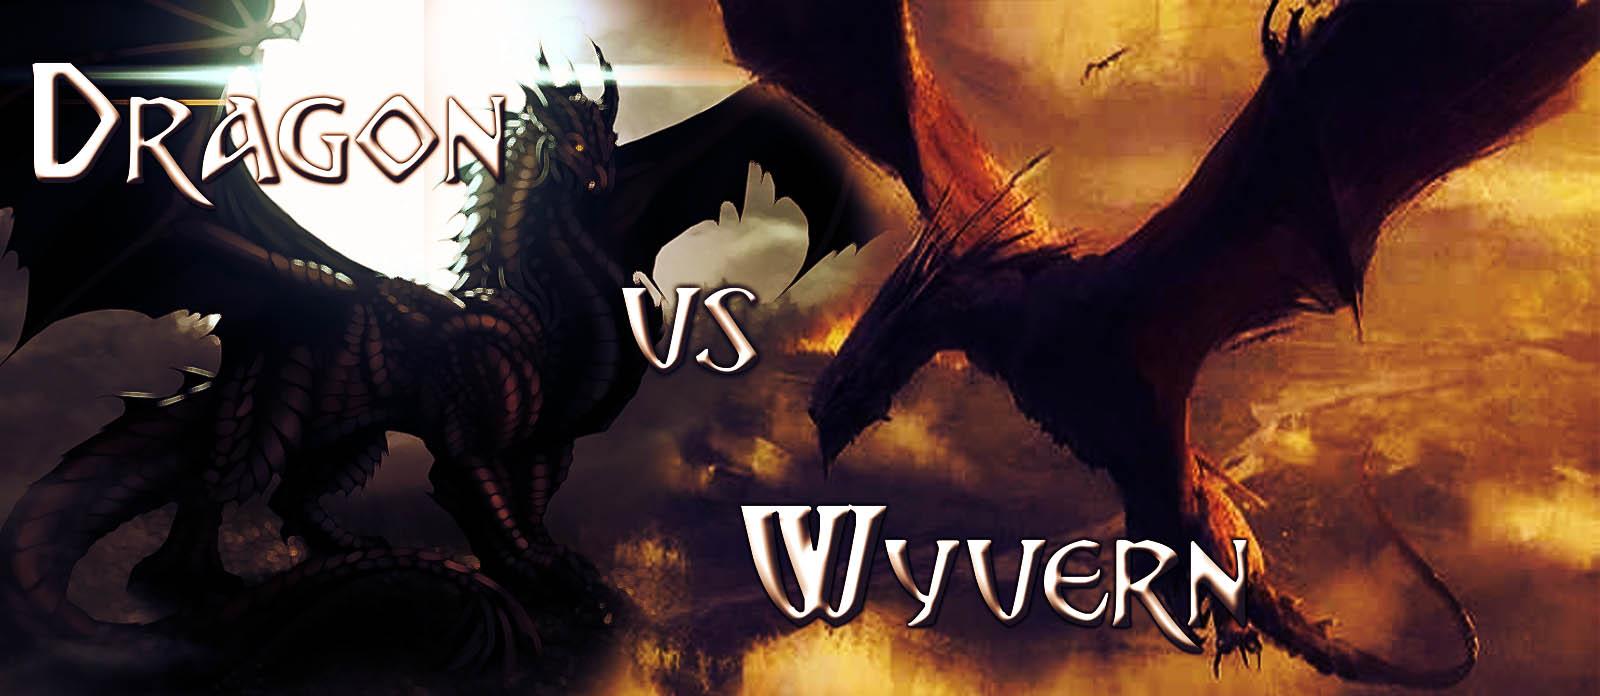 Dragon vs Wyvern